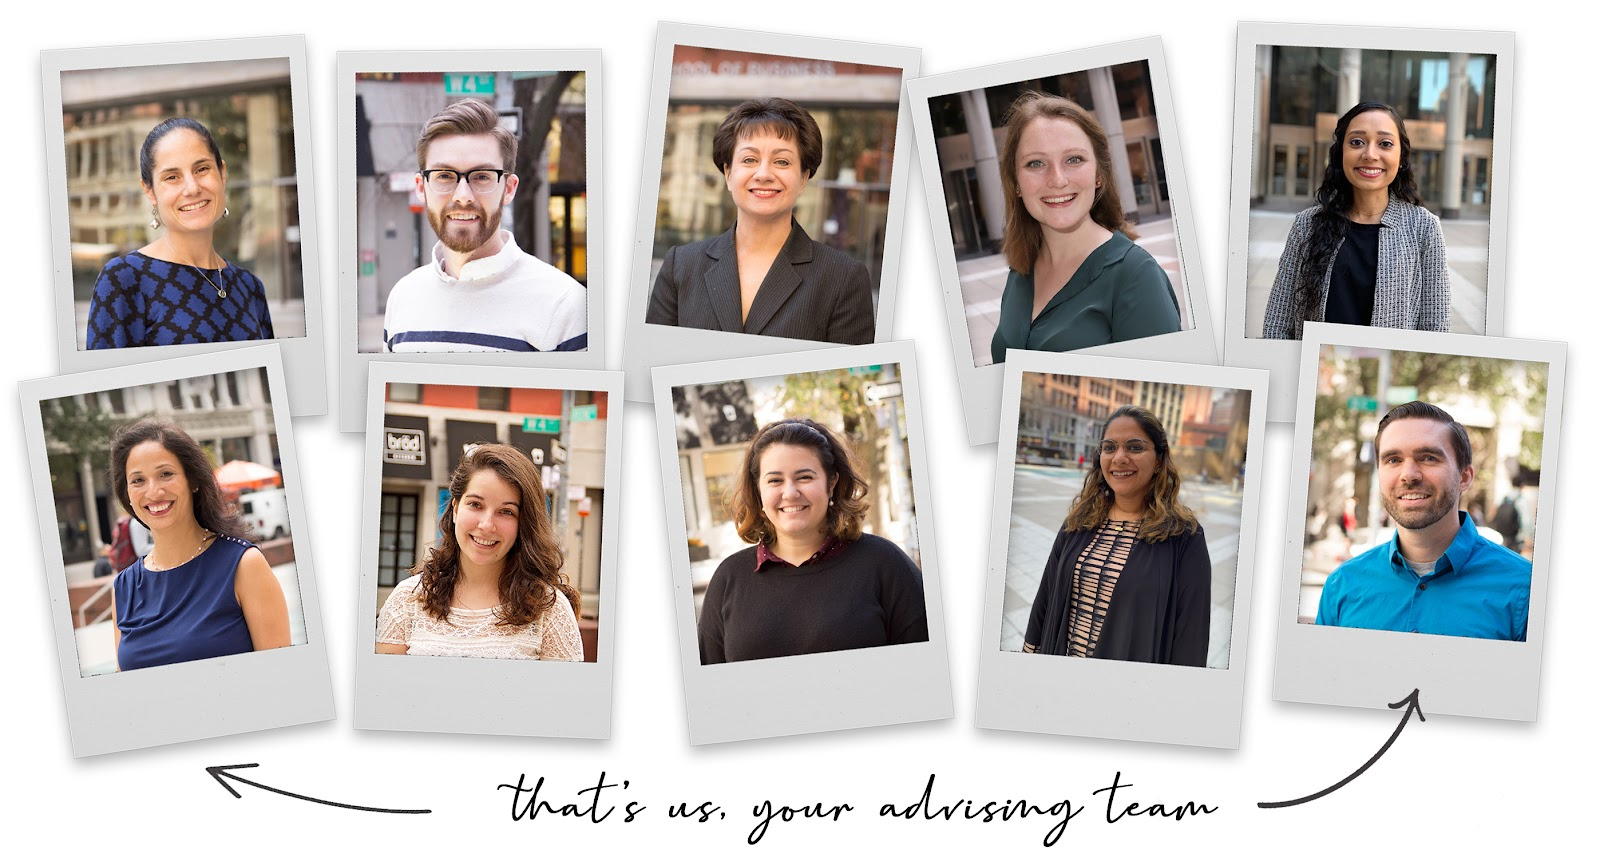 Polaroids of Advising Team Members